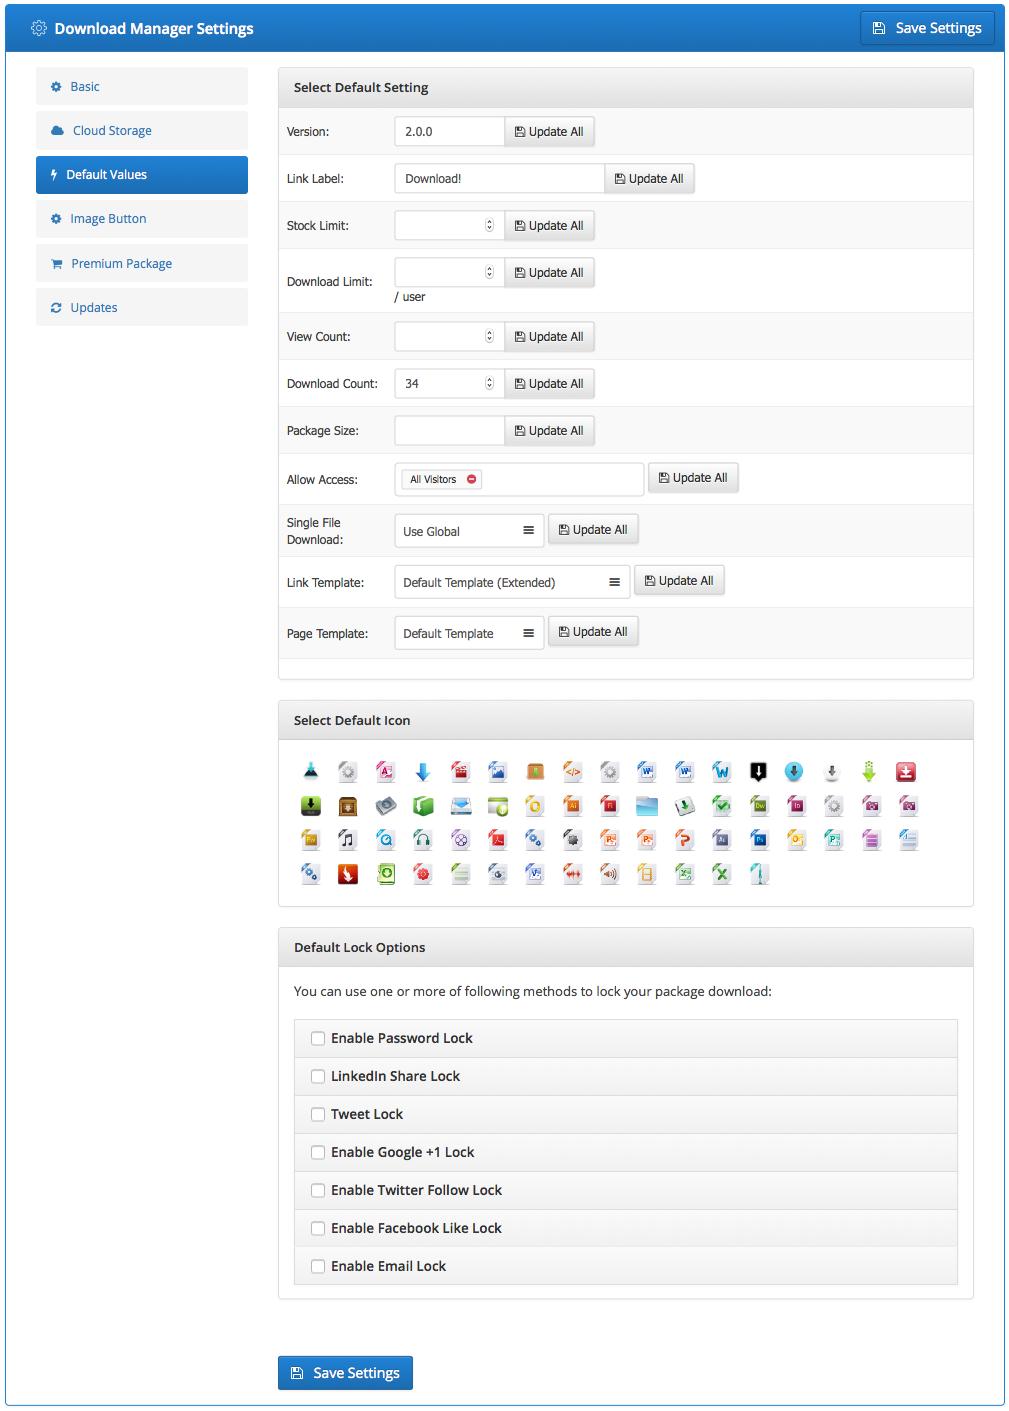 wordpress download manager default values addon